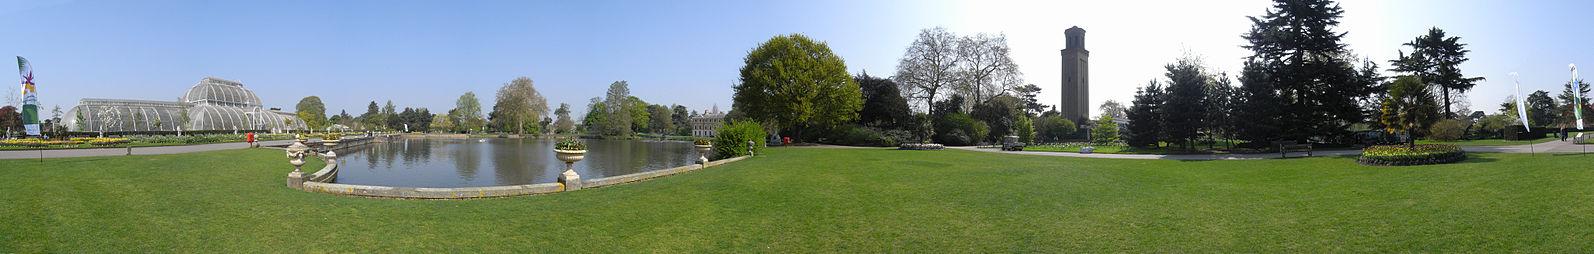 Kew_Gardens_6262-79